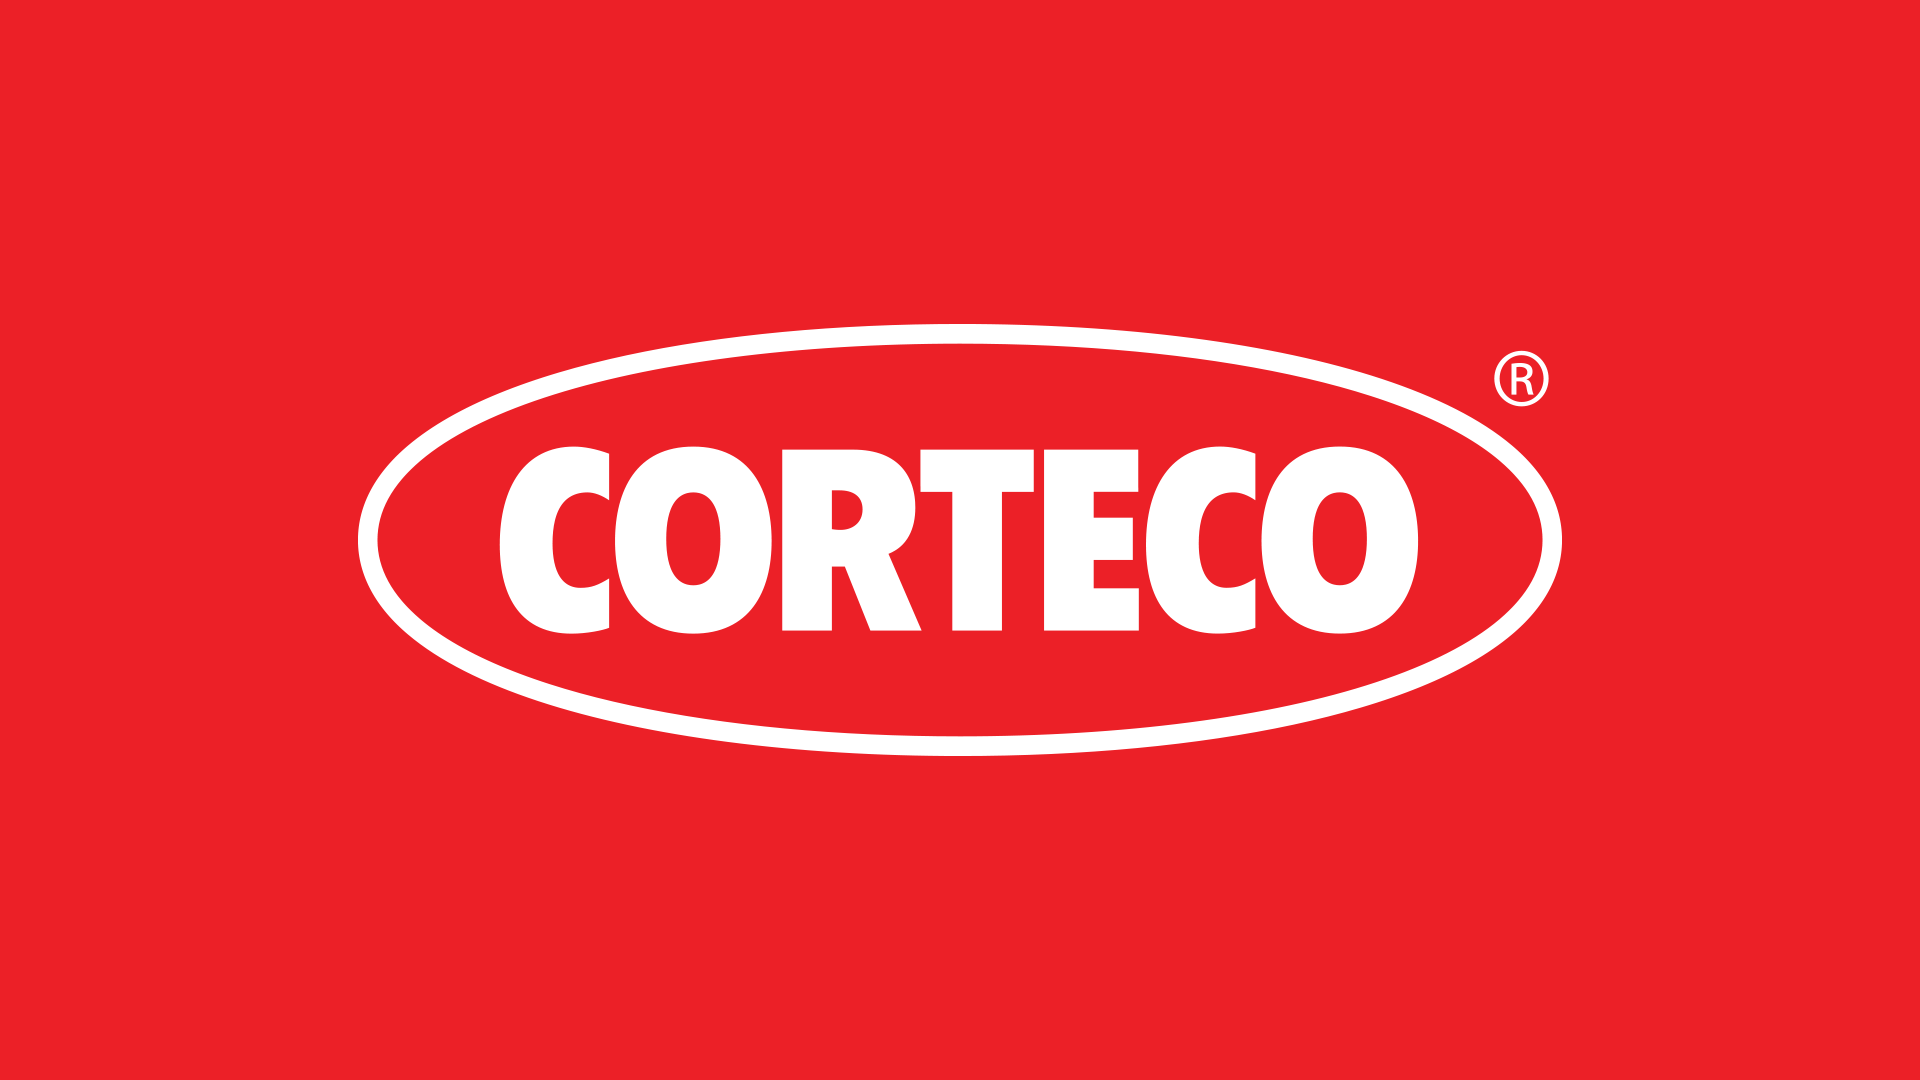 Corteco-bg